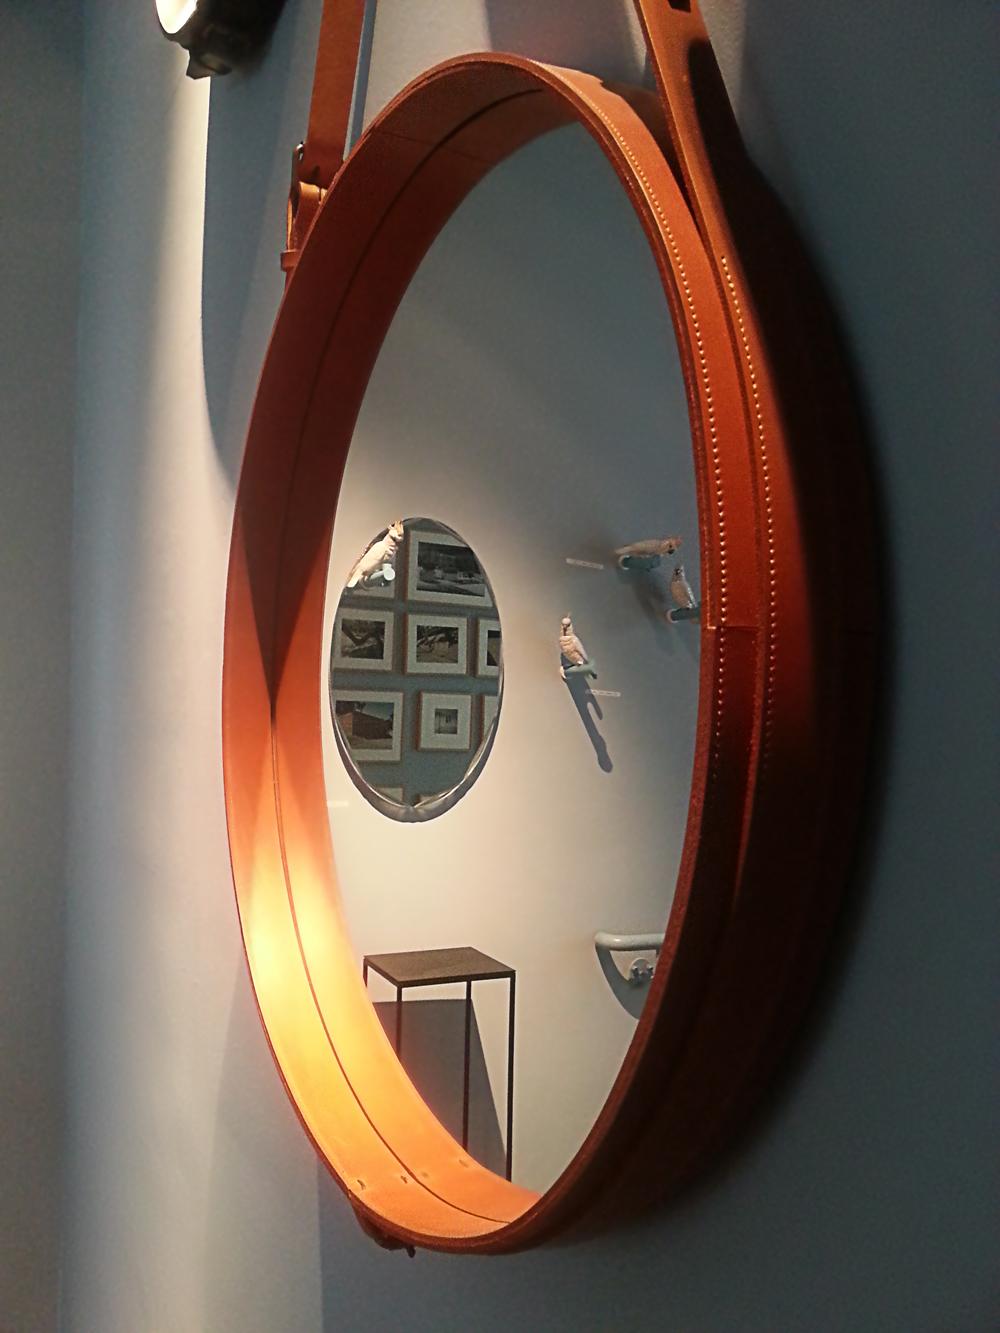 Spiegel Reflektion Dopo Domani Foto